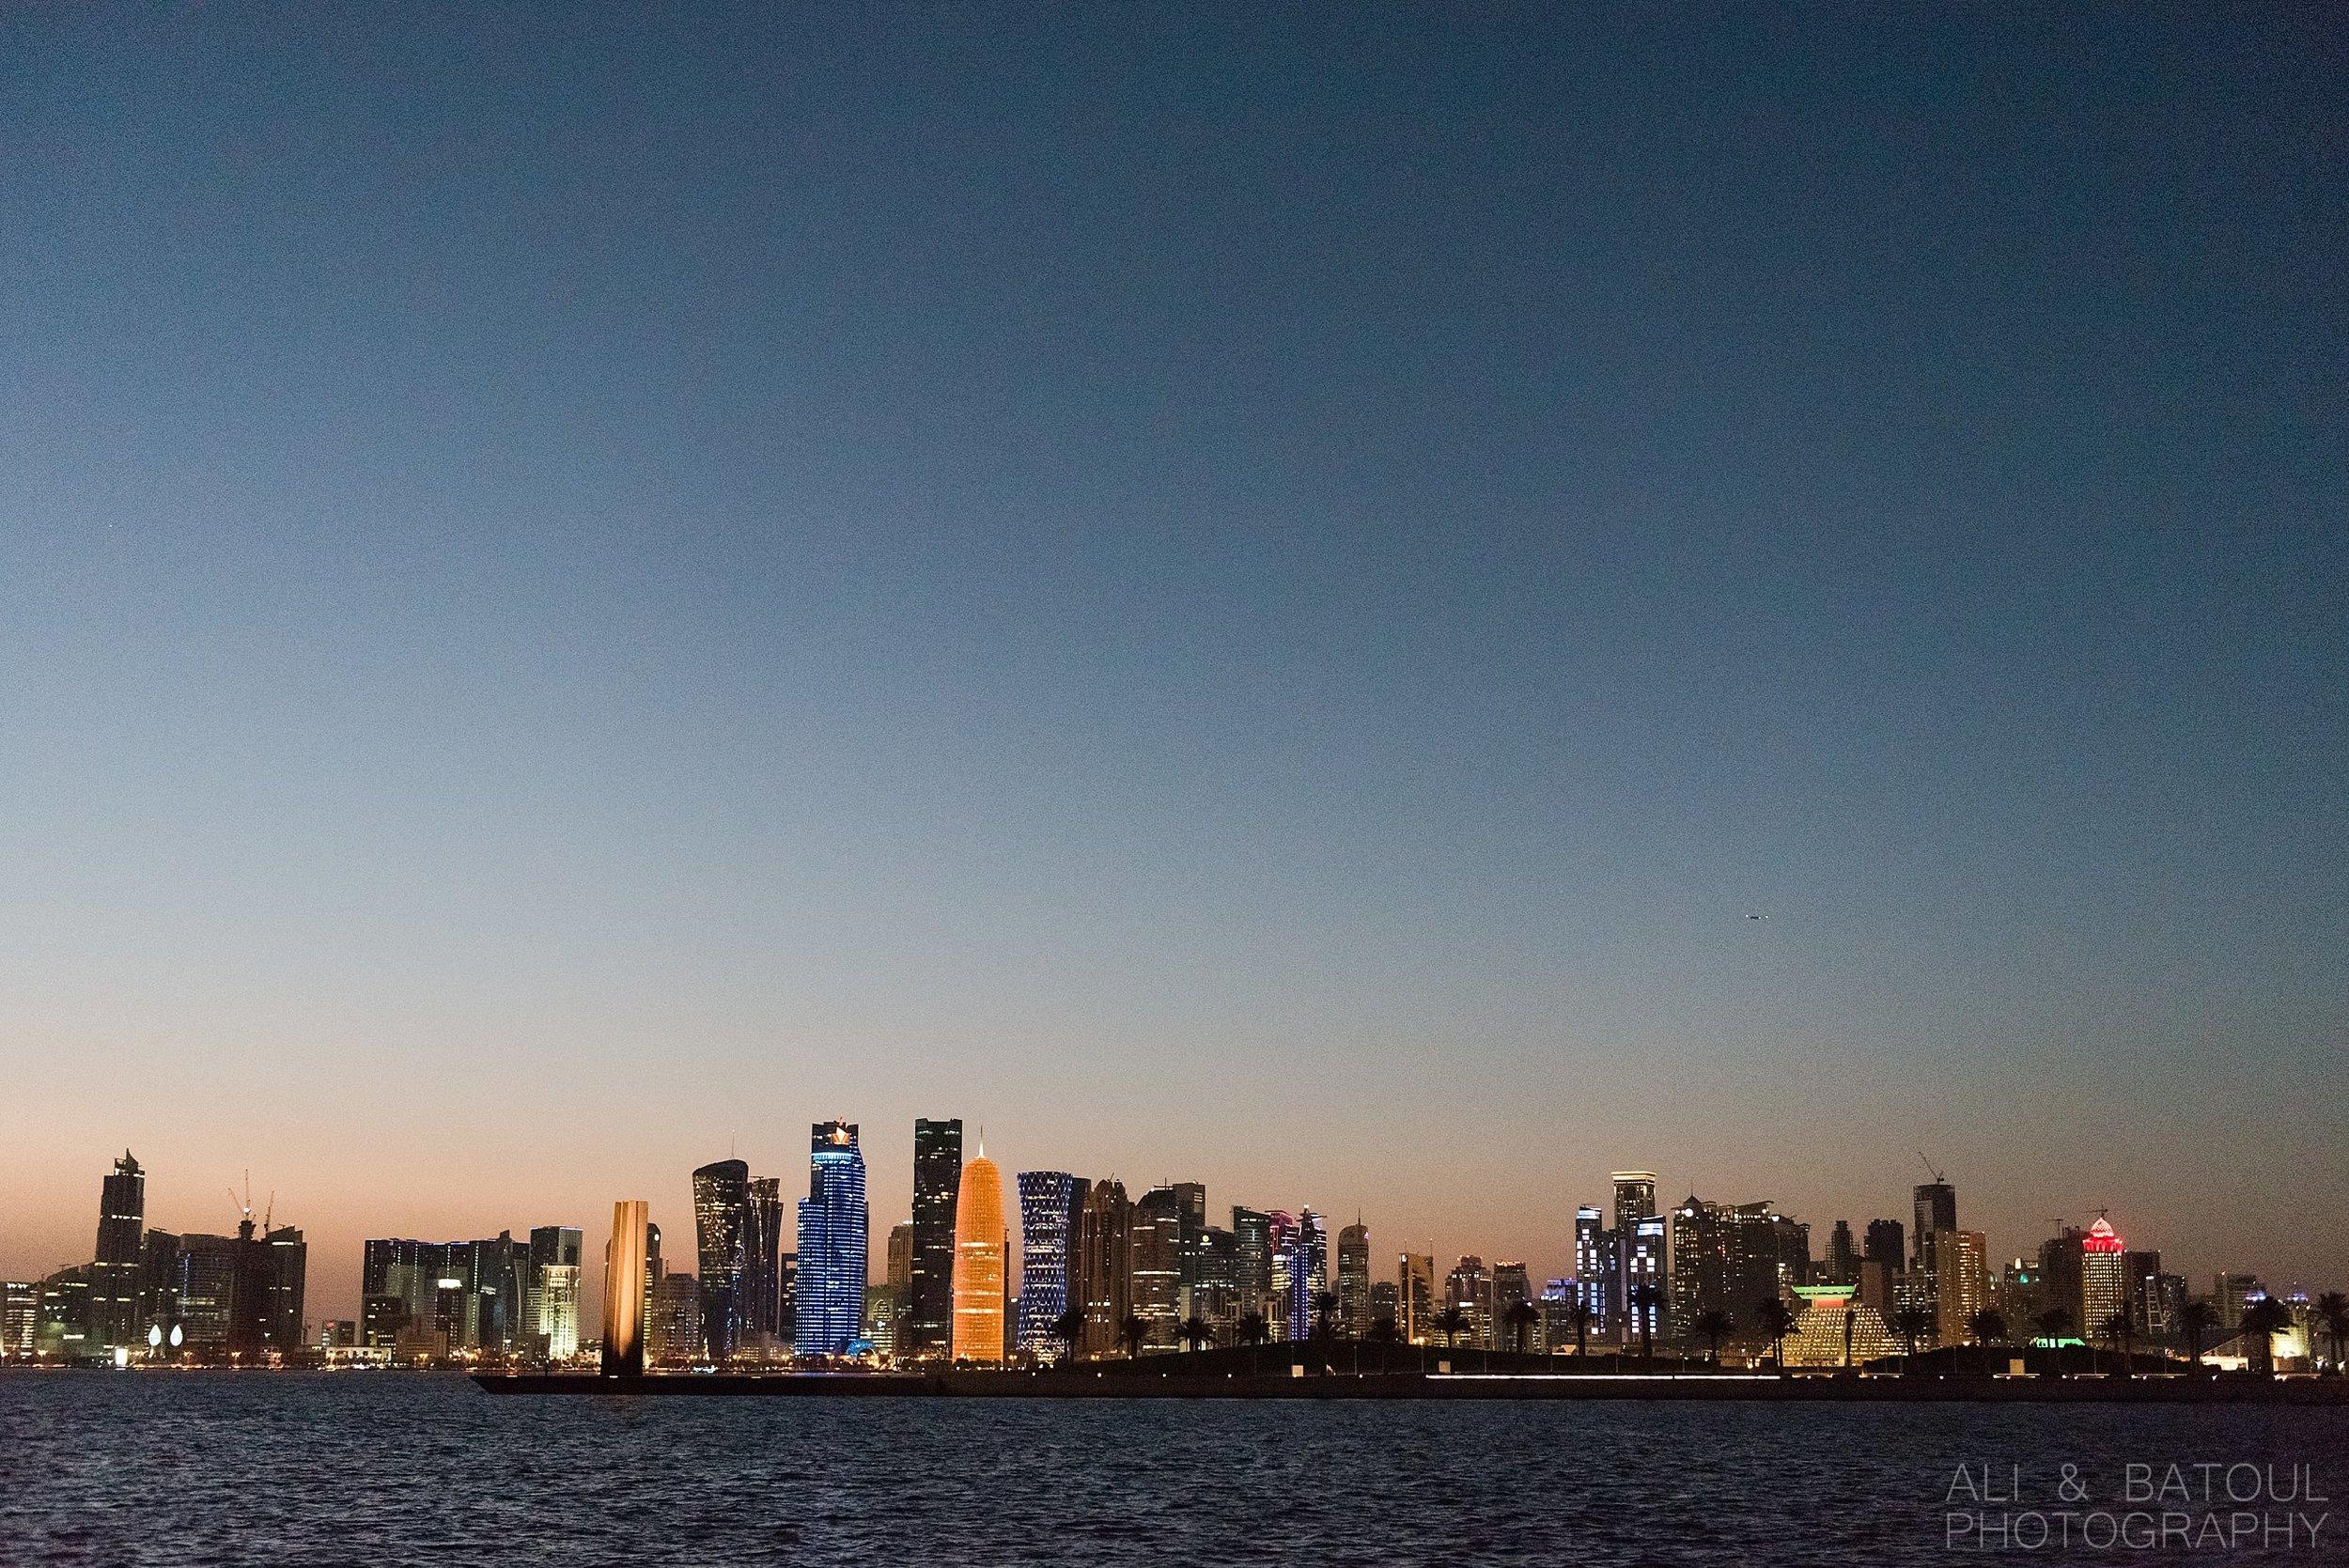 Ali & Batoul Photography - Doha Travel Photography_0058.jpg